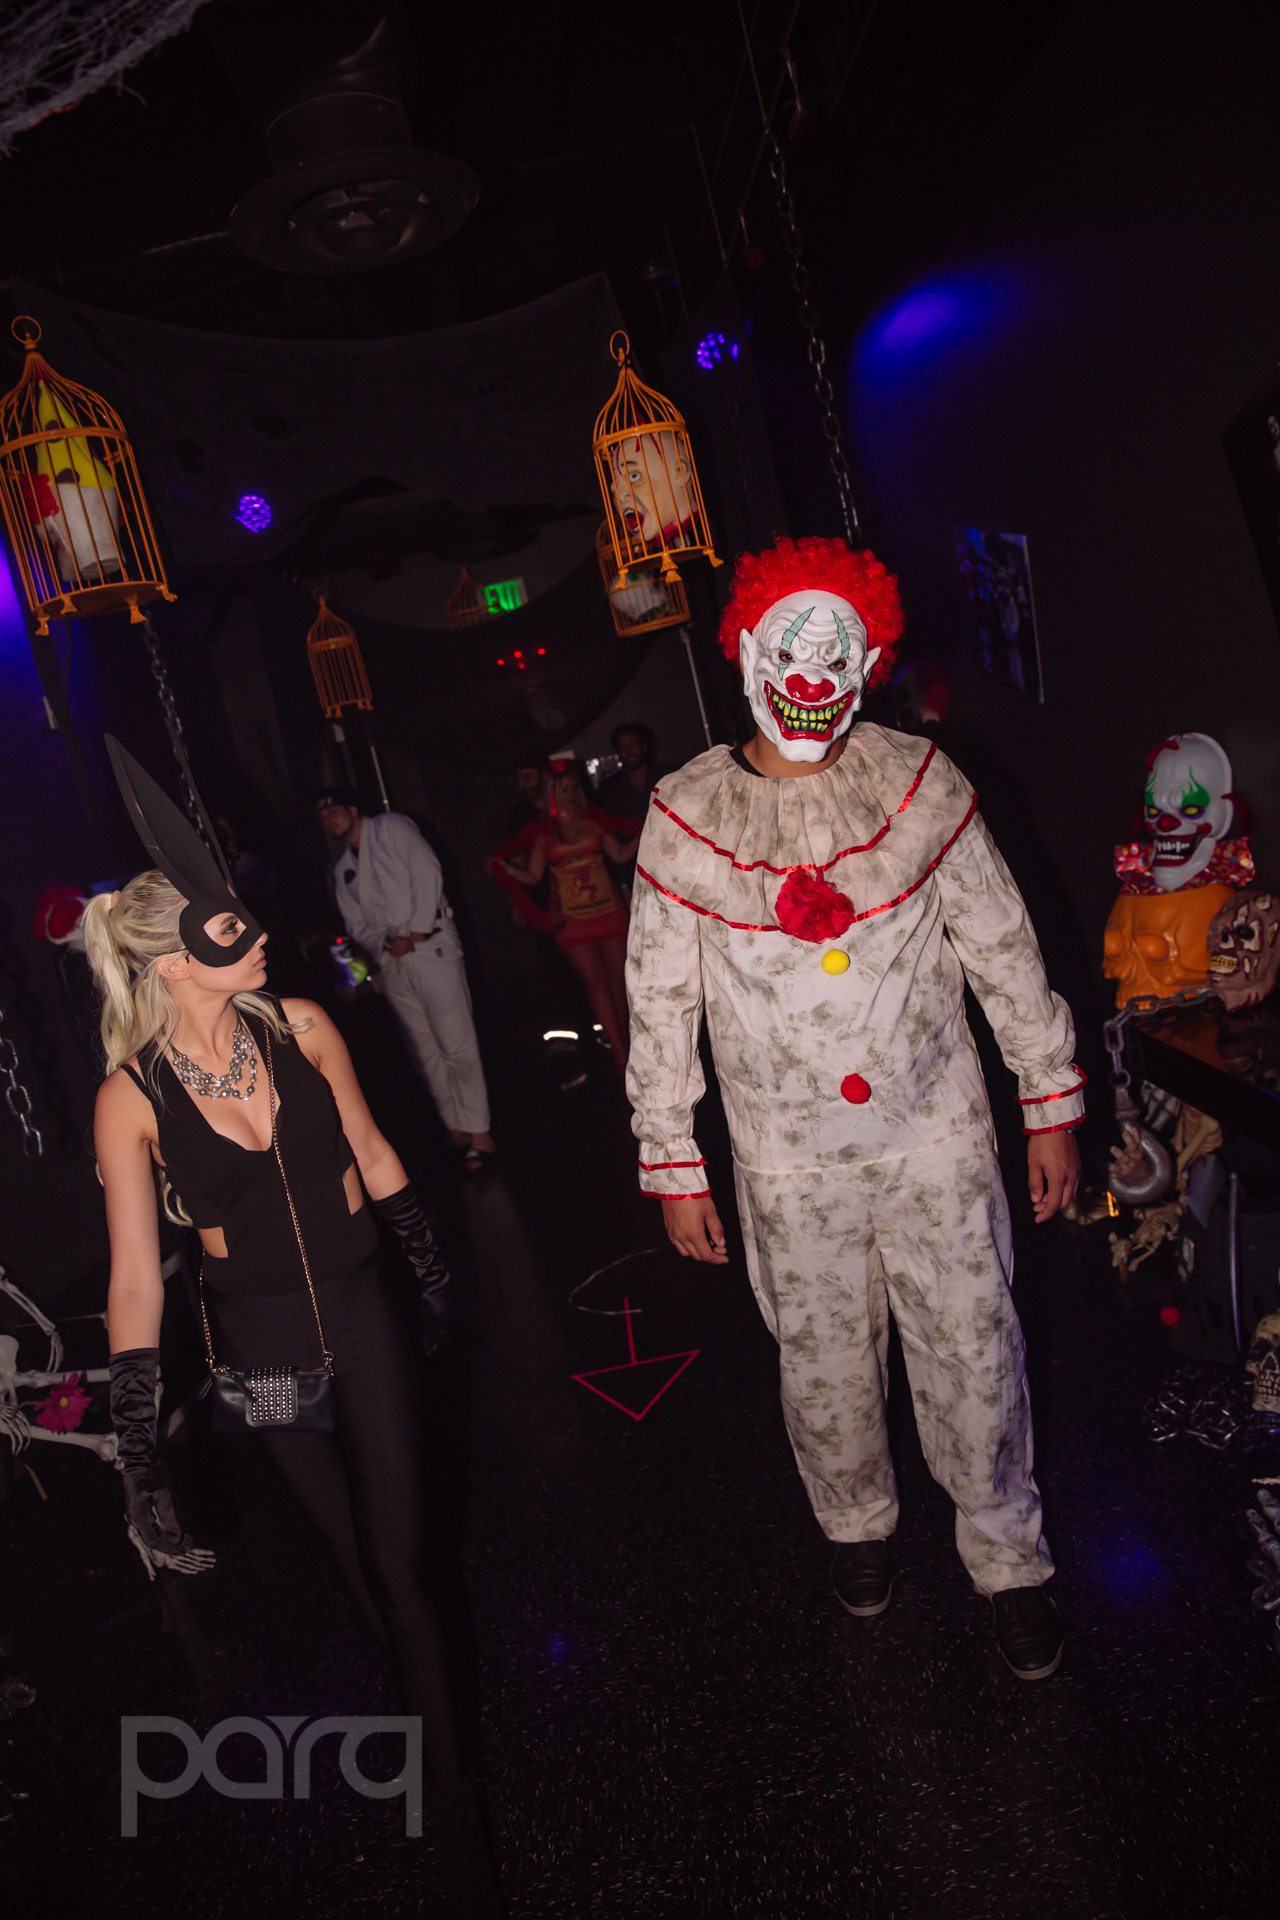 10.28.17 Parq - Haunted Circus-68.jpg